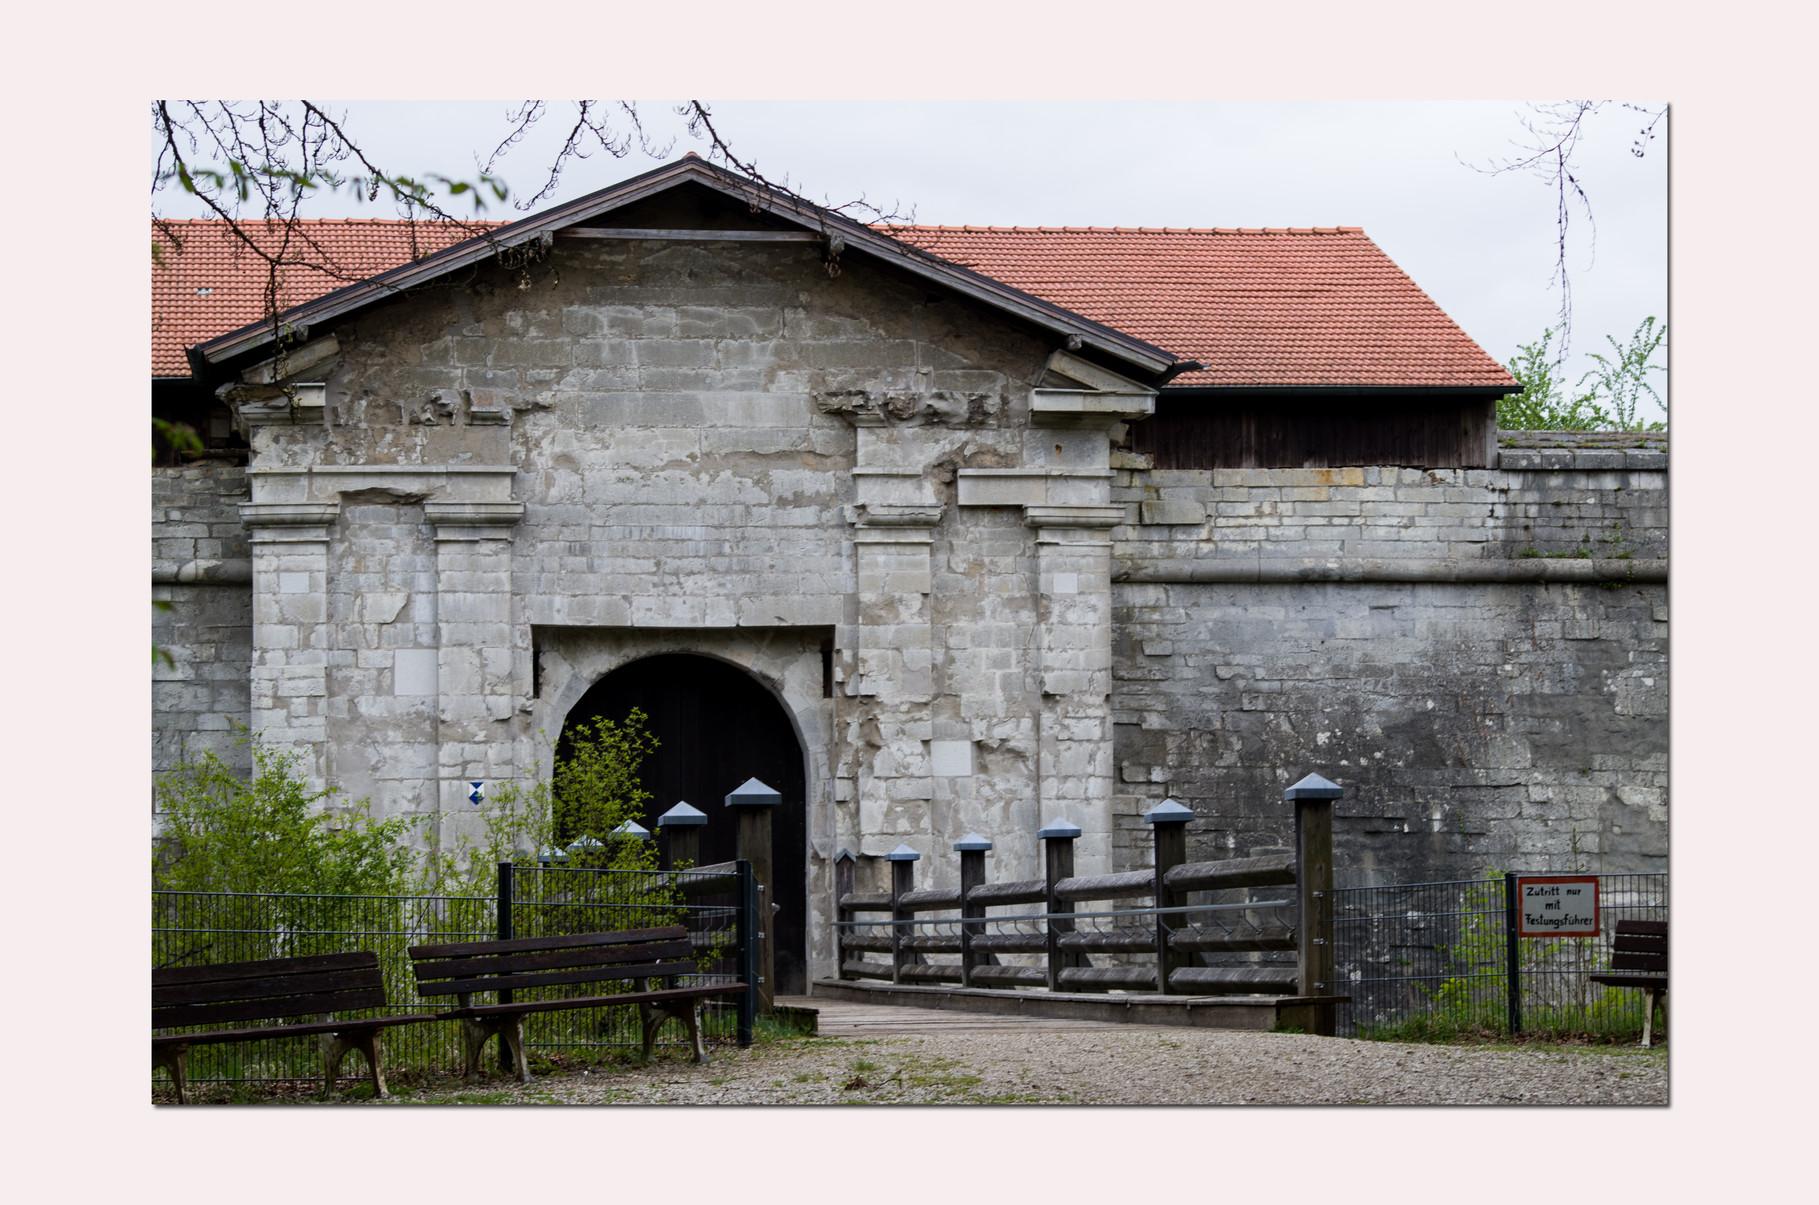 Eingang zur Feste Rothenberg